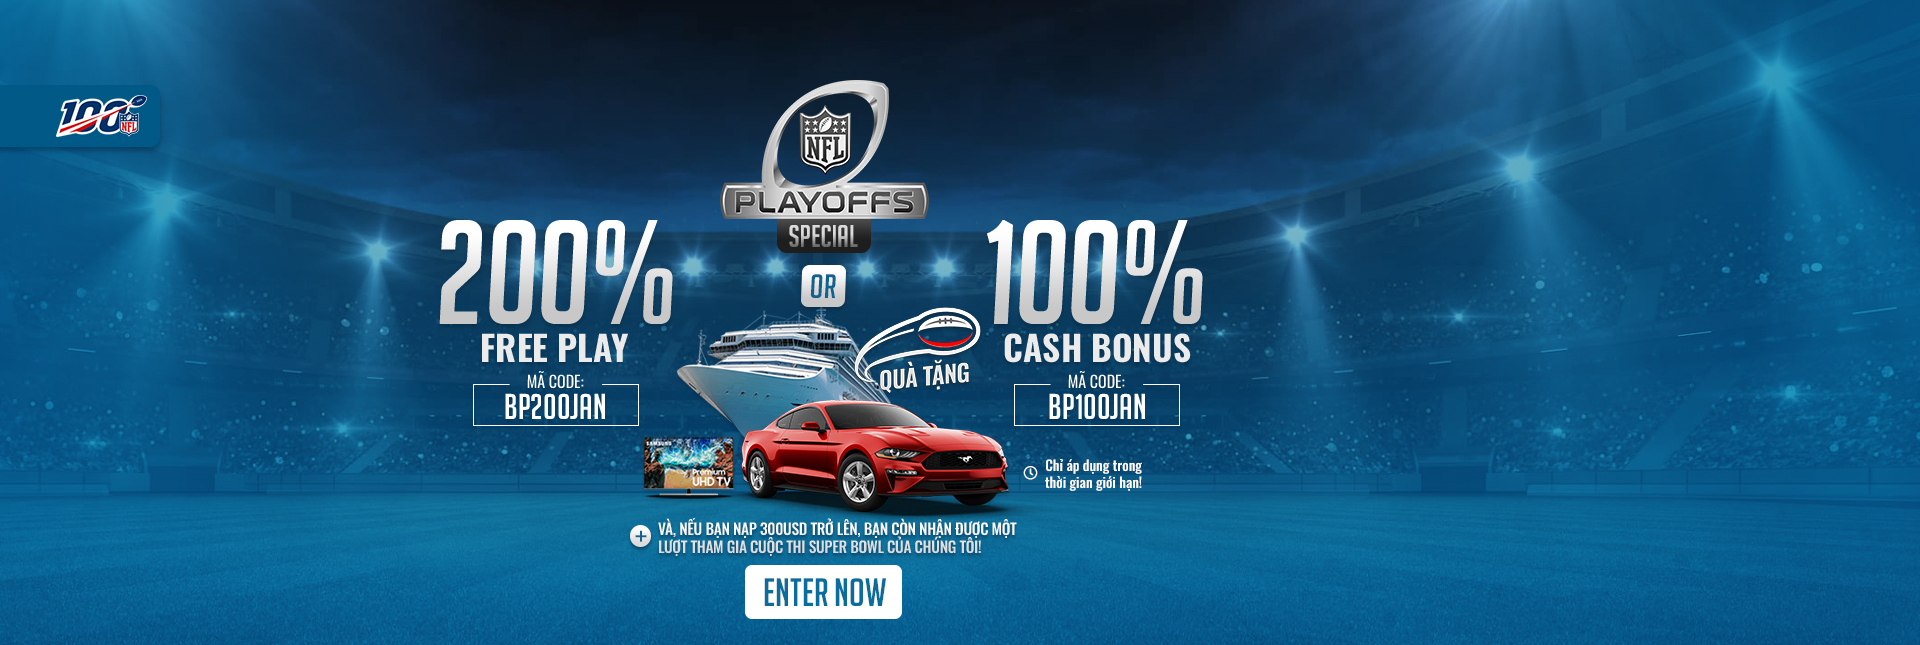 NFL Playoffs Special: 200% Free Play or 100% Cash Bonus